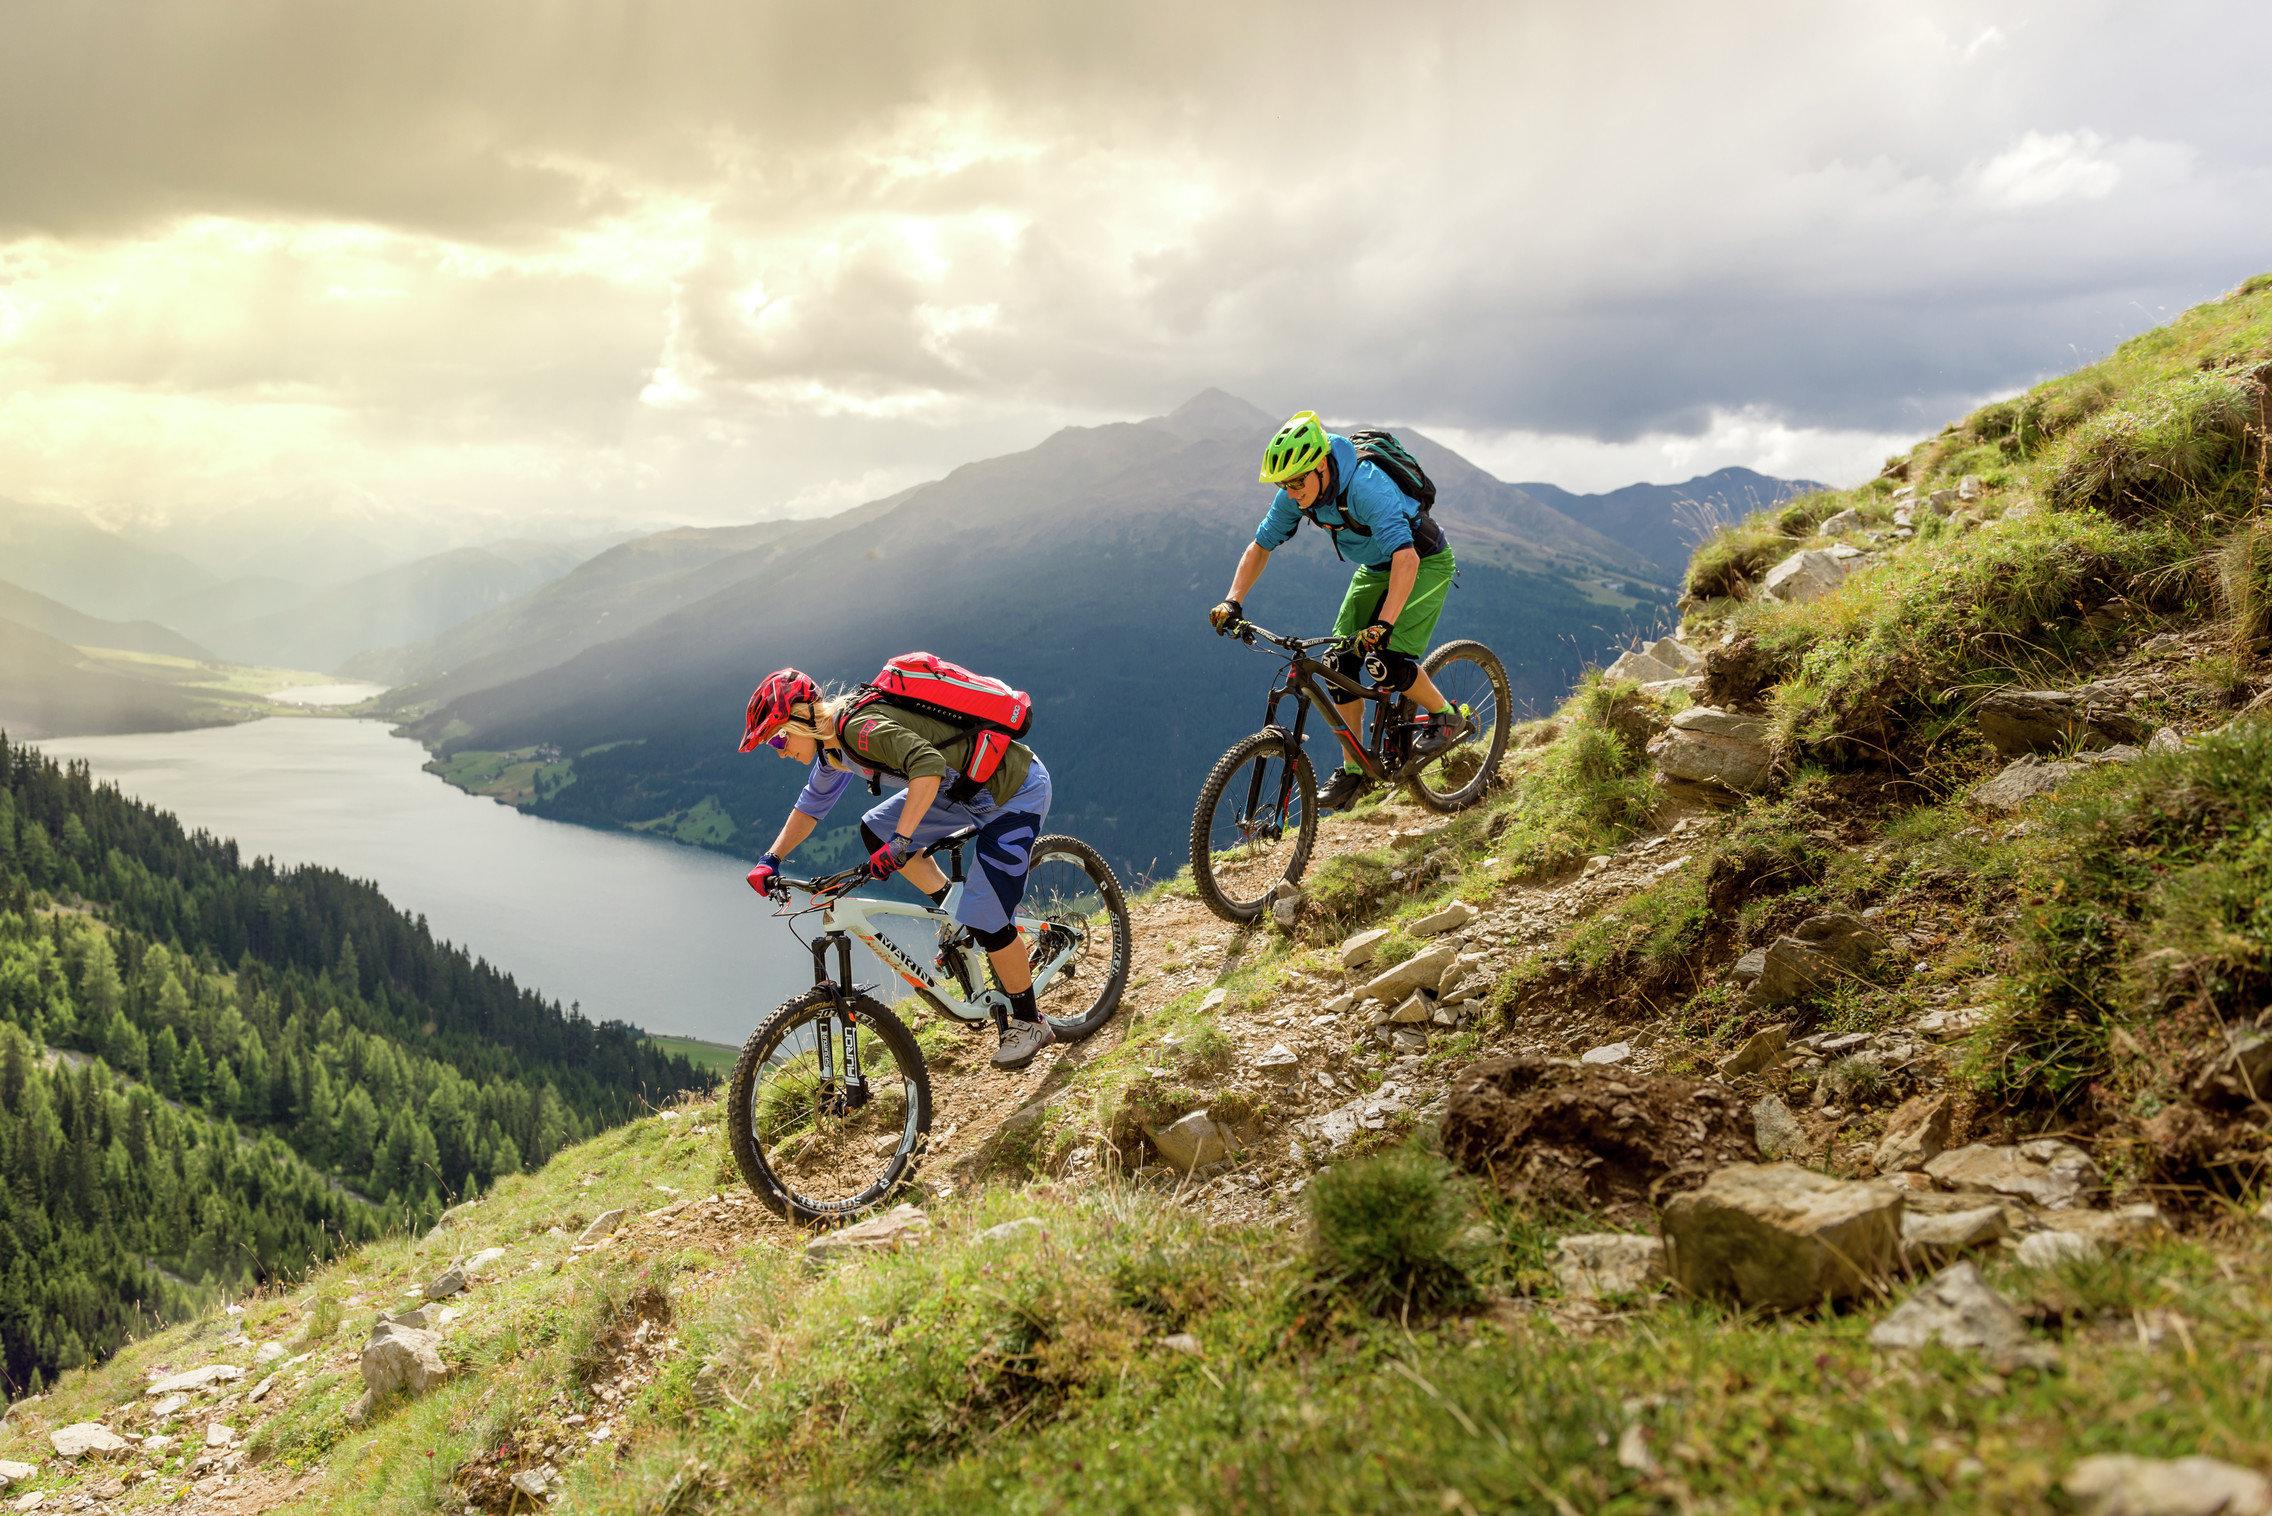 Bike-Free Angebot